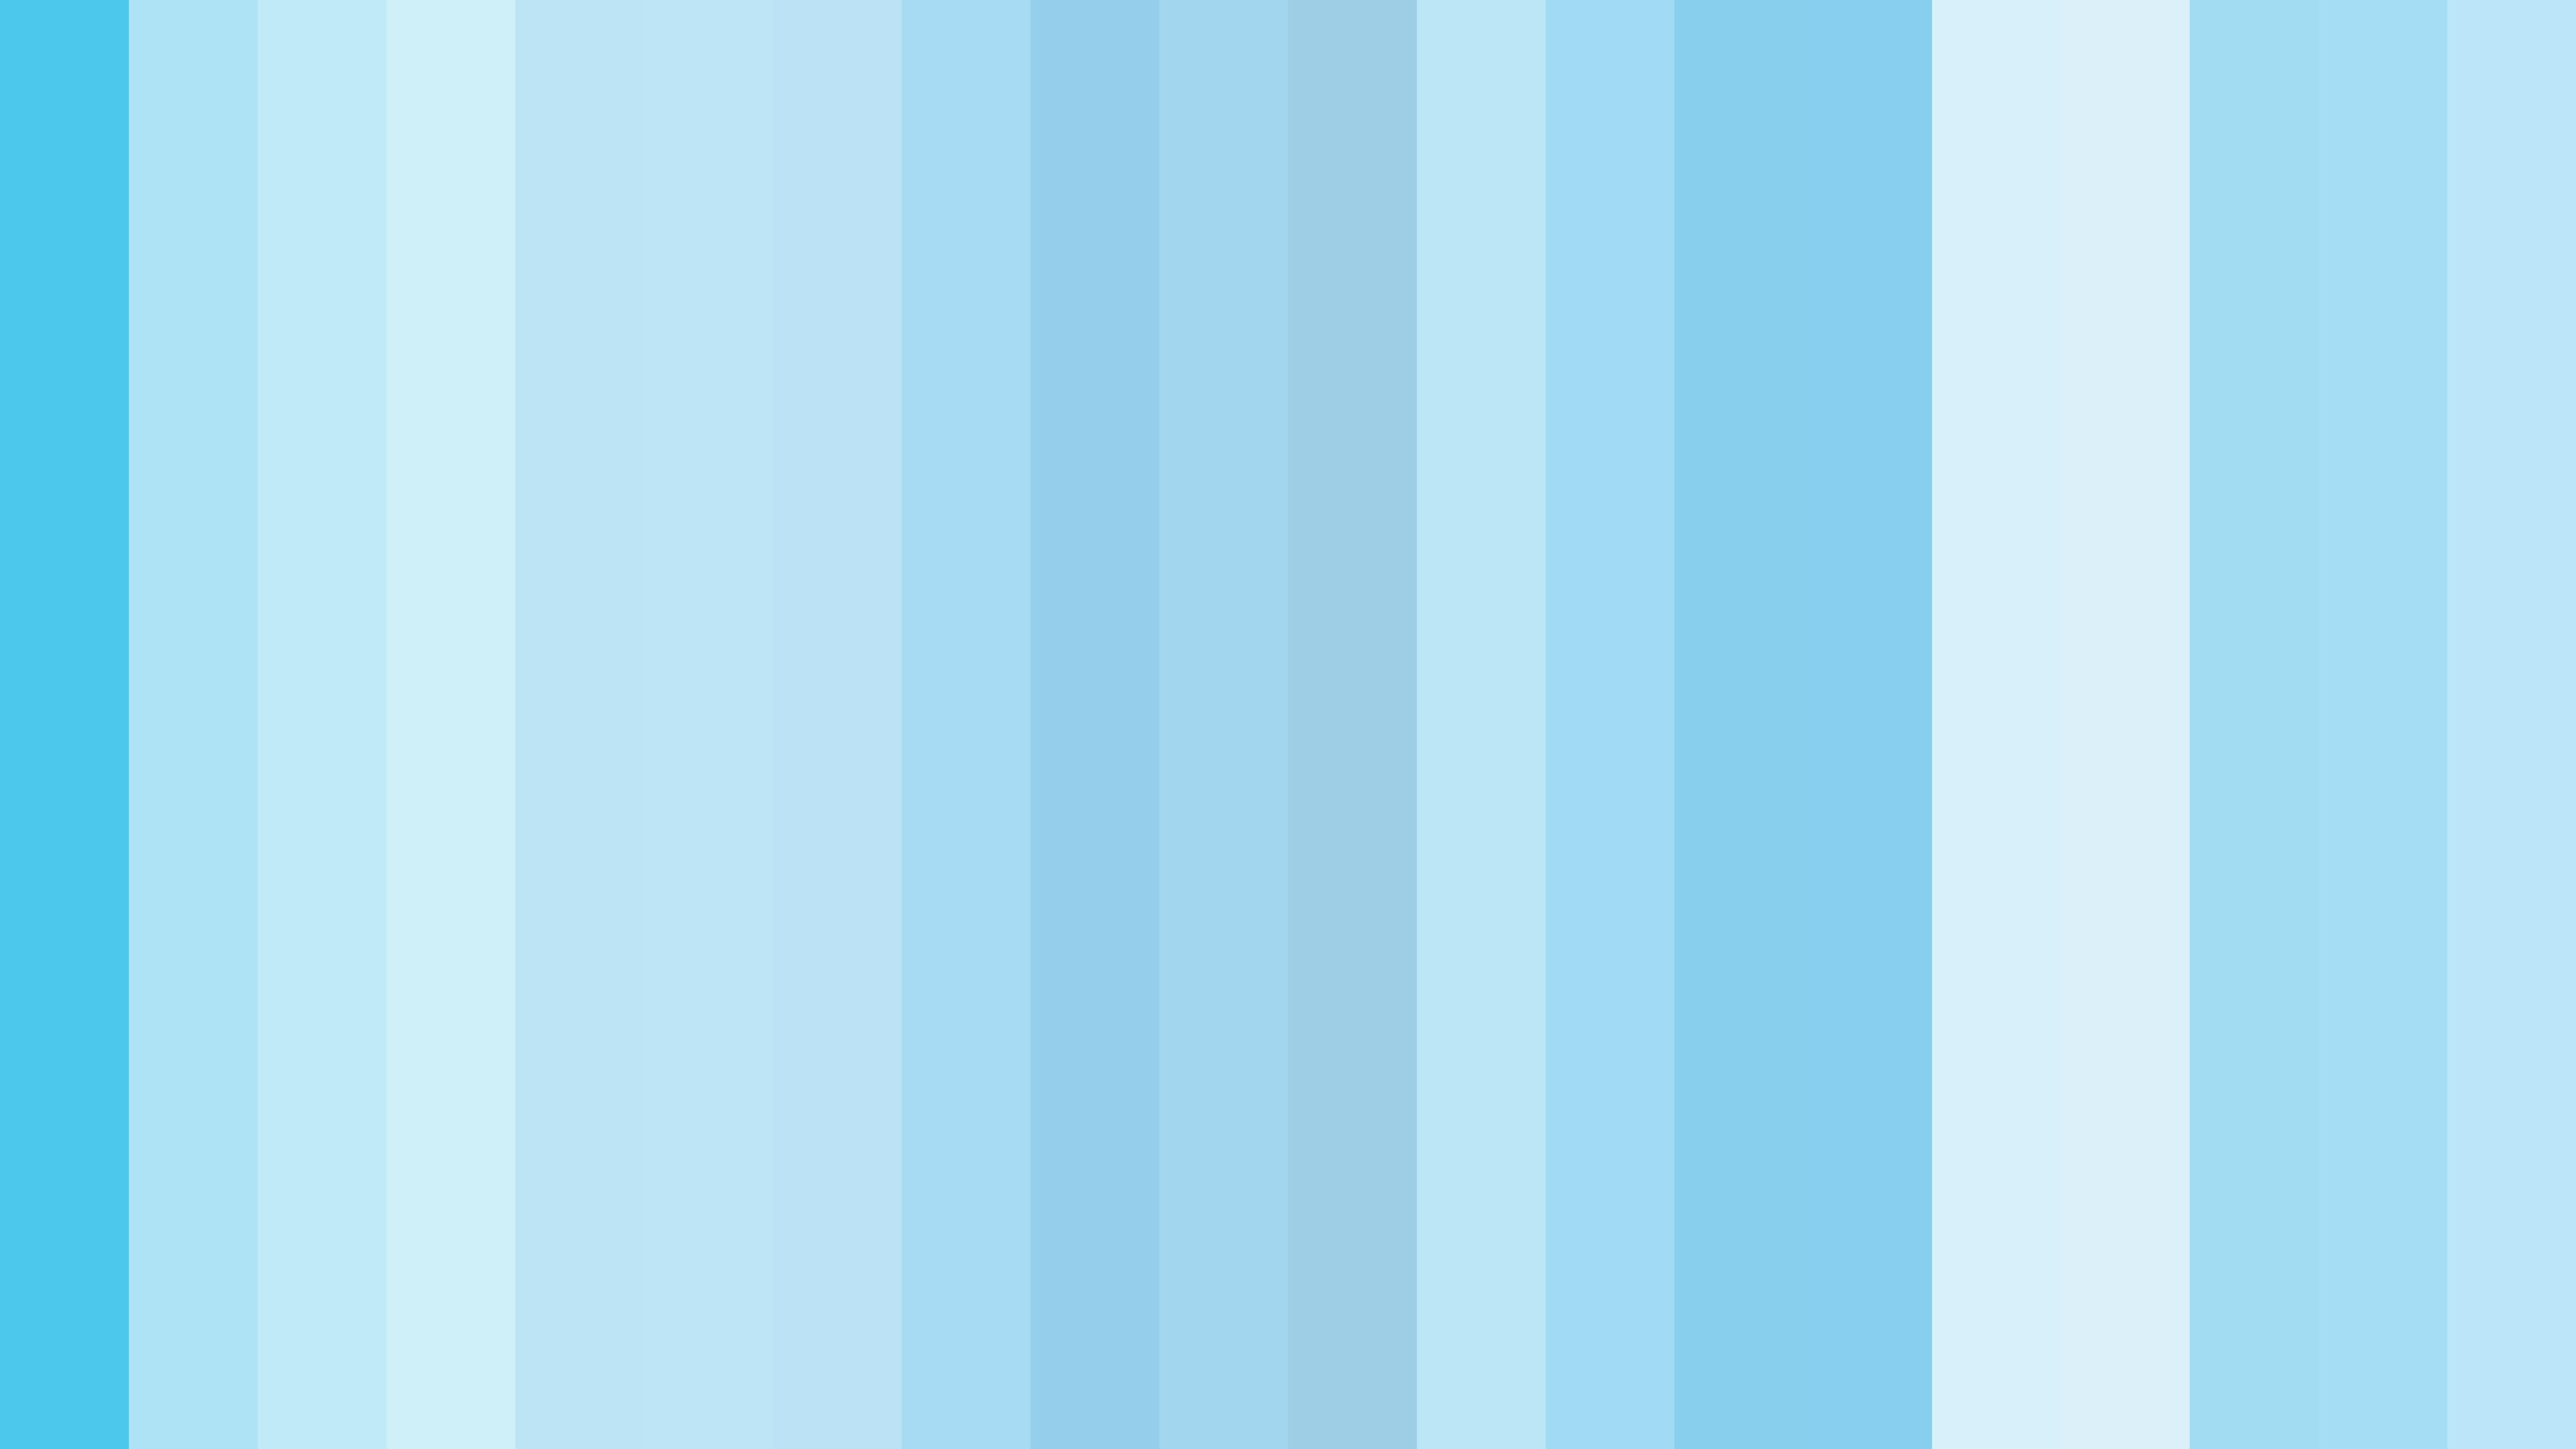 Free Light Blue Striped Background